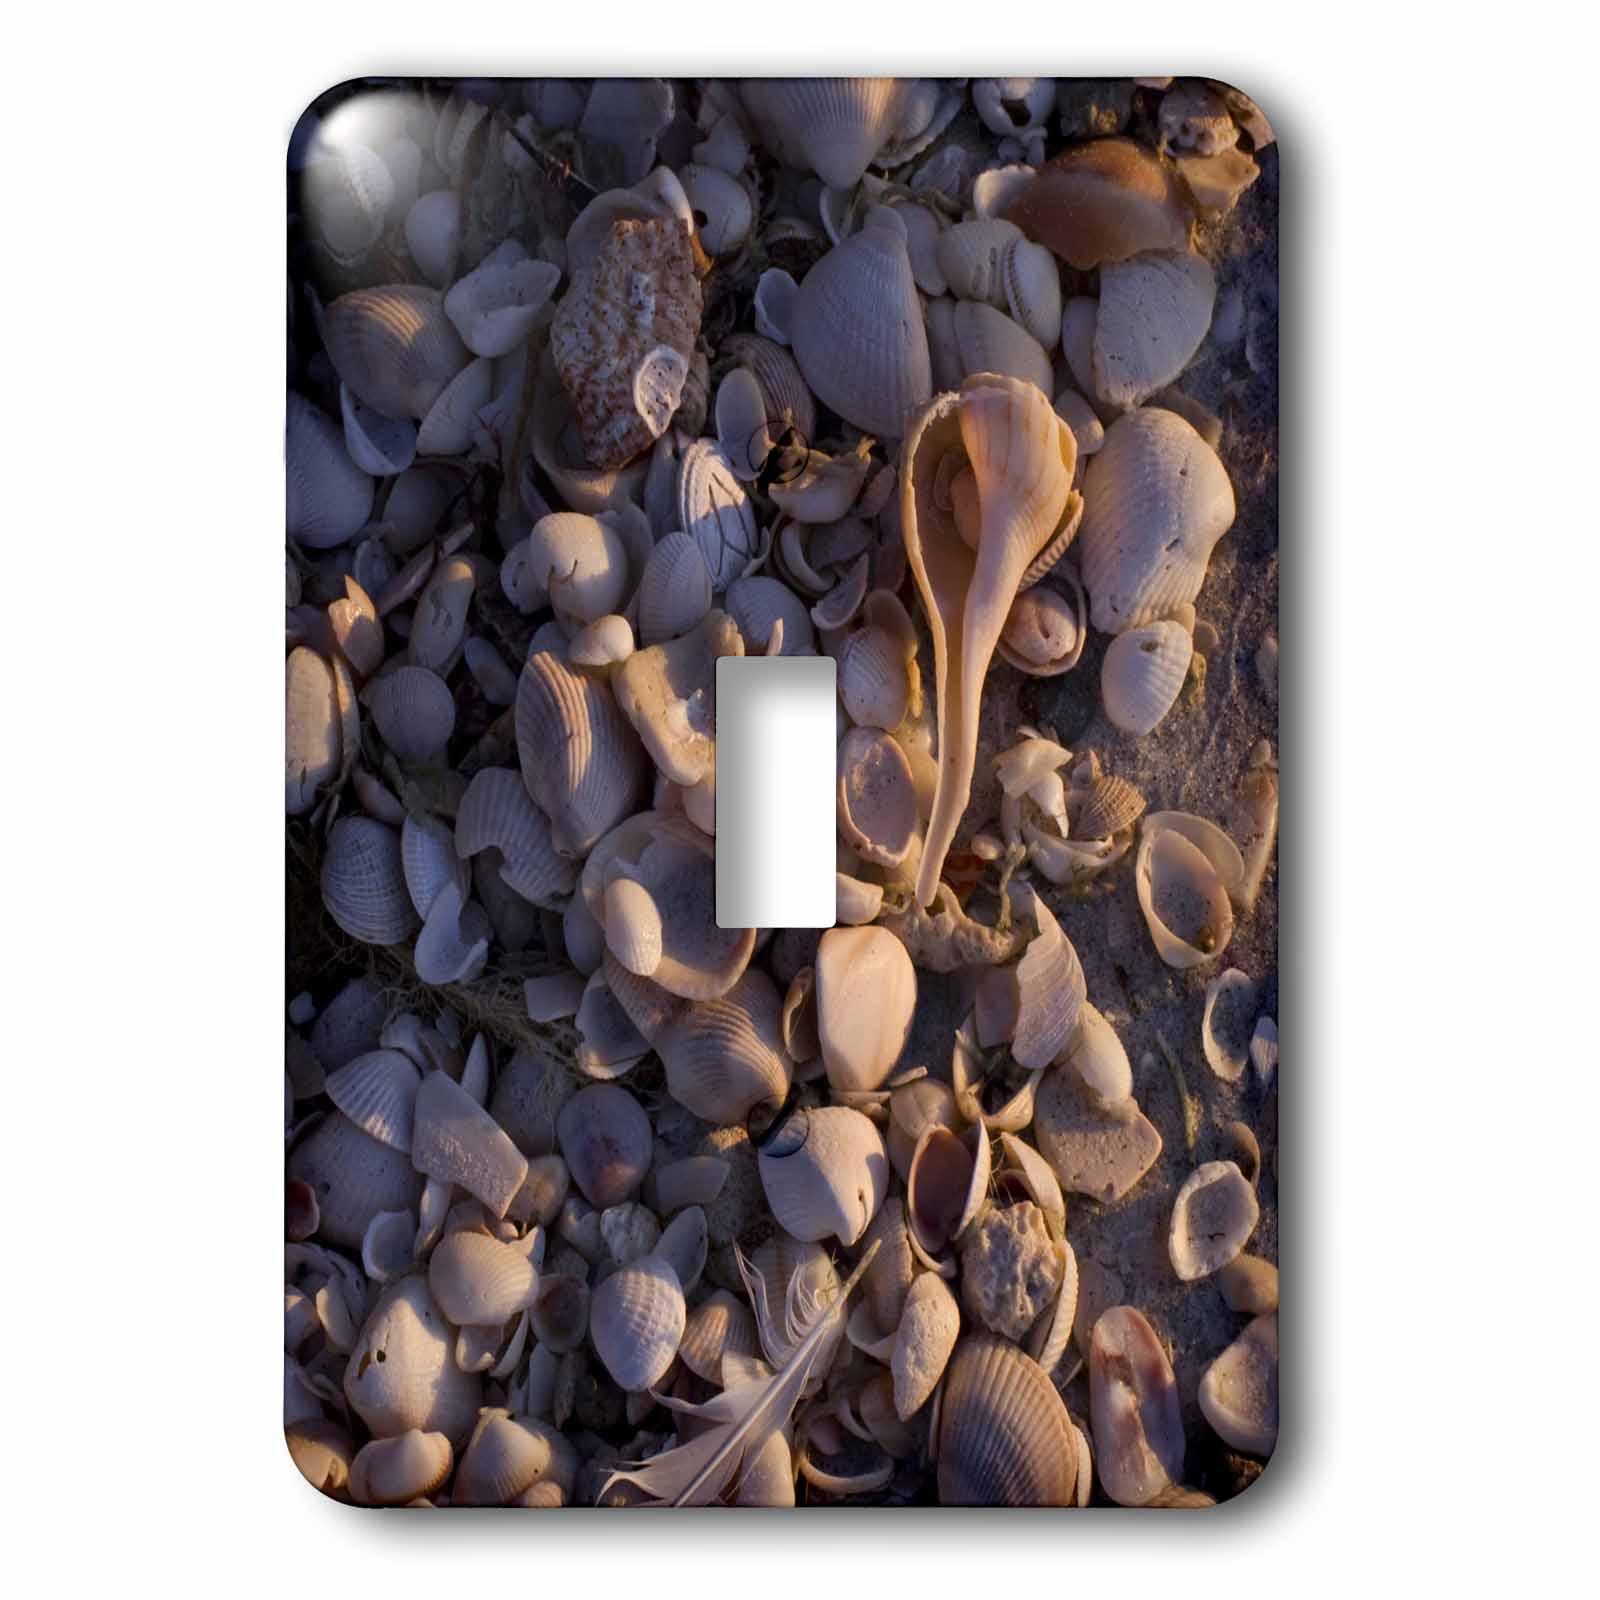 3dRose Sea shells, Captiva Island, Florida - US10 MPR0288 - Maresa Pryor, Double Toggle Switch